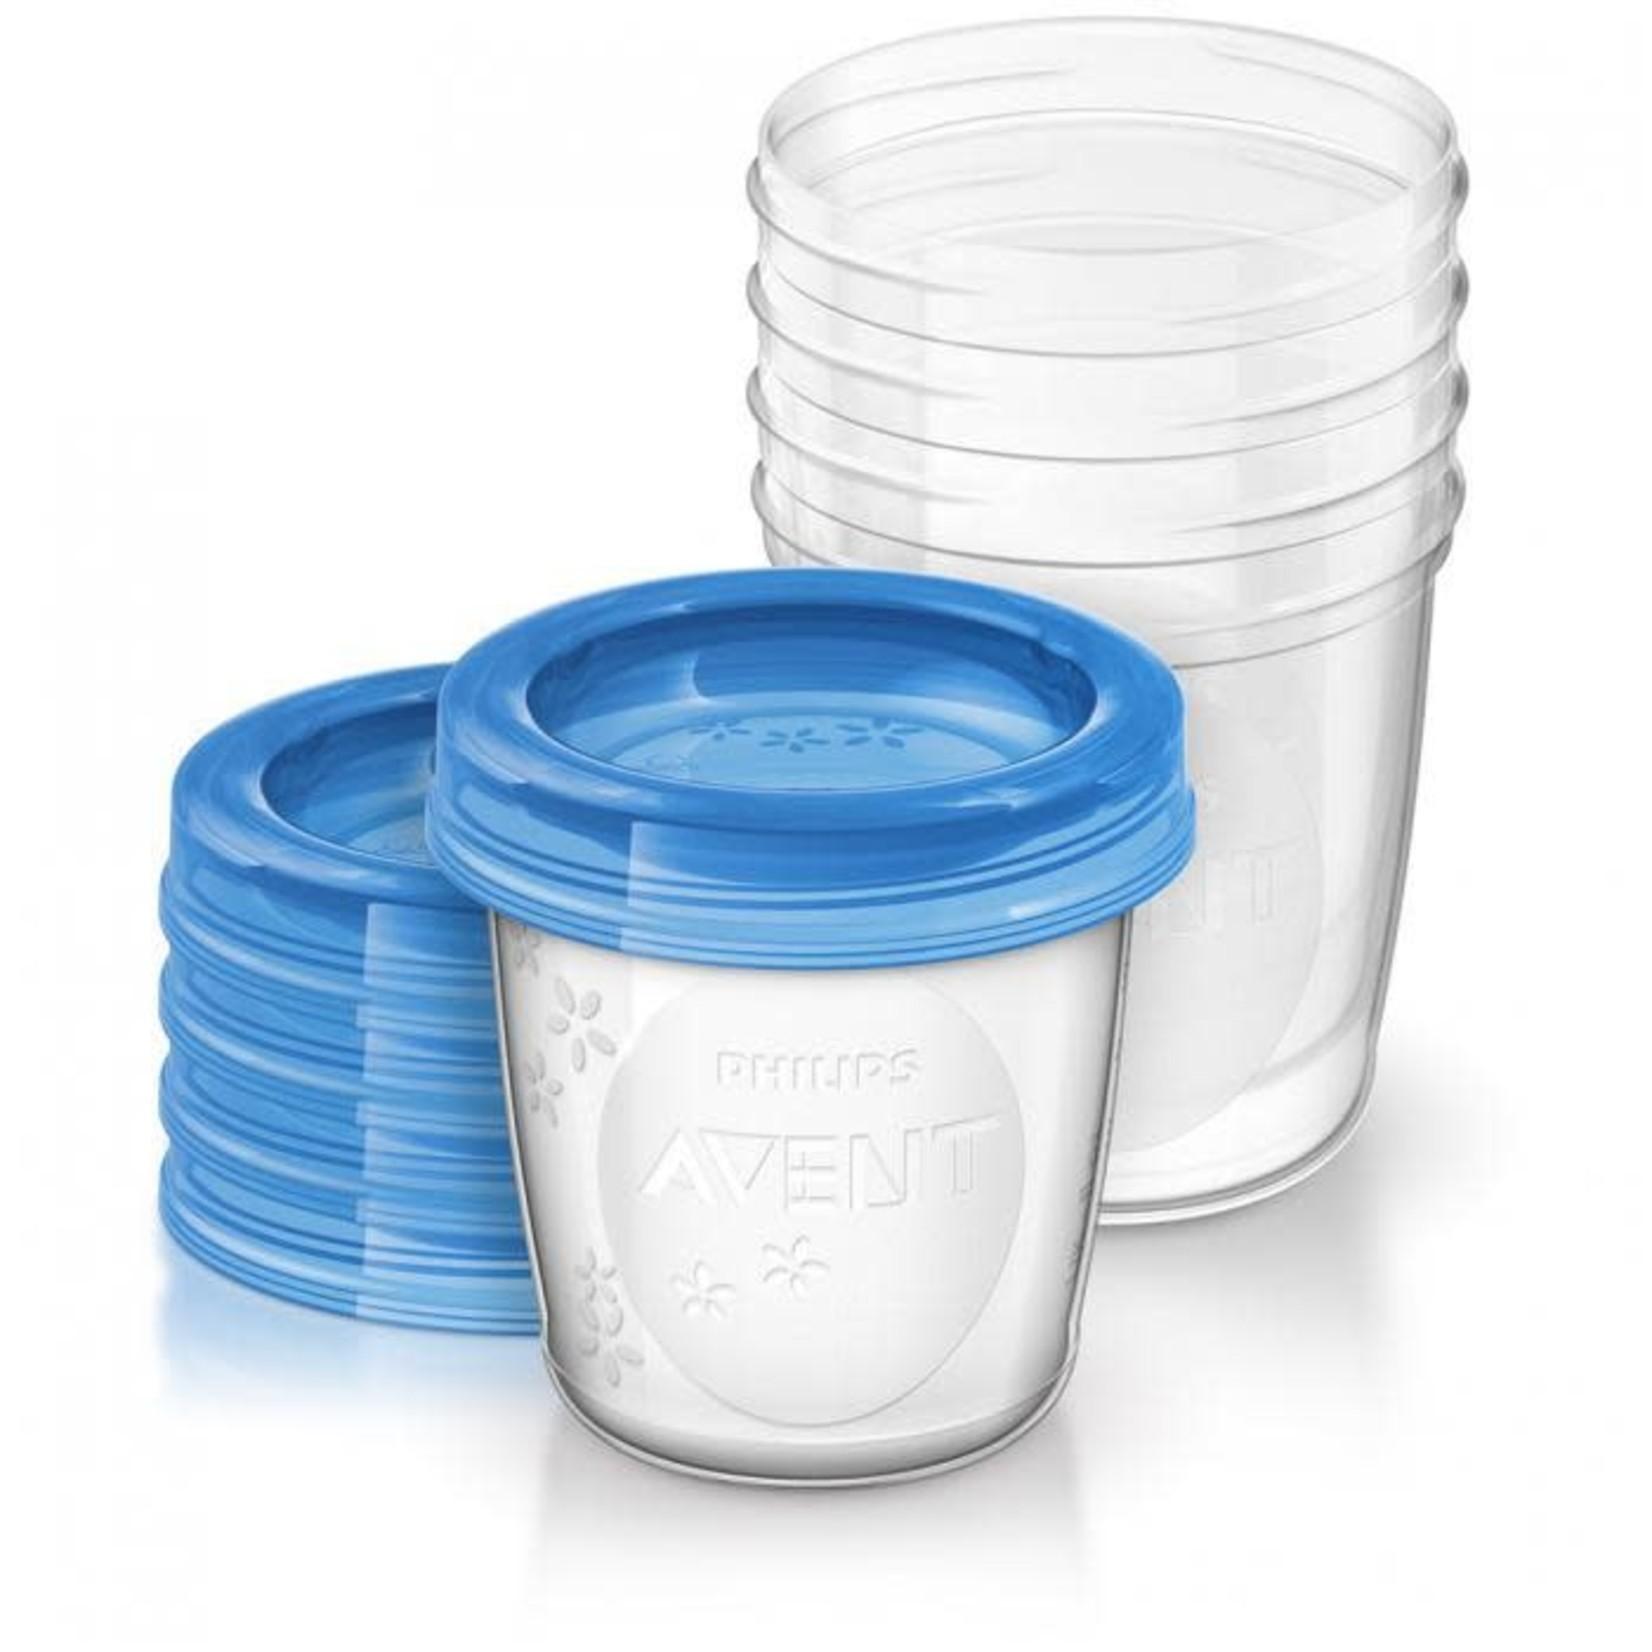 Philips Avent Bewaarbekers voor moedermelk 180ml (5 stuks)